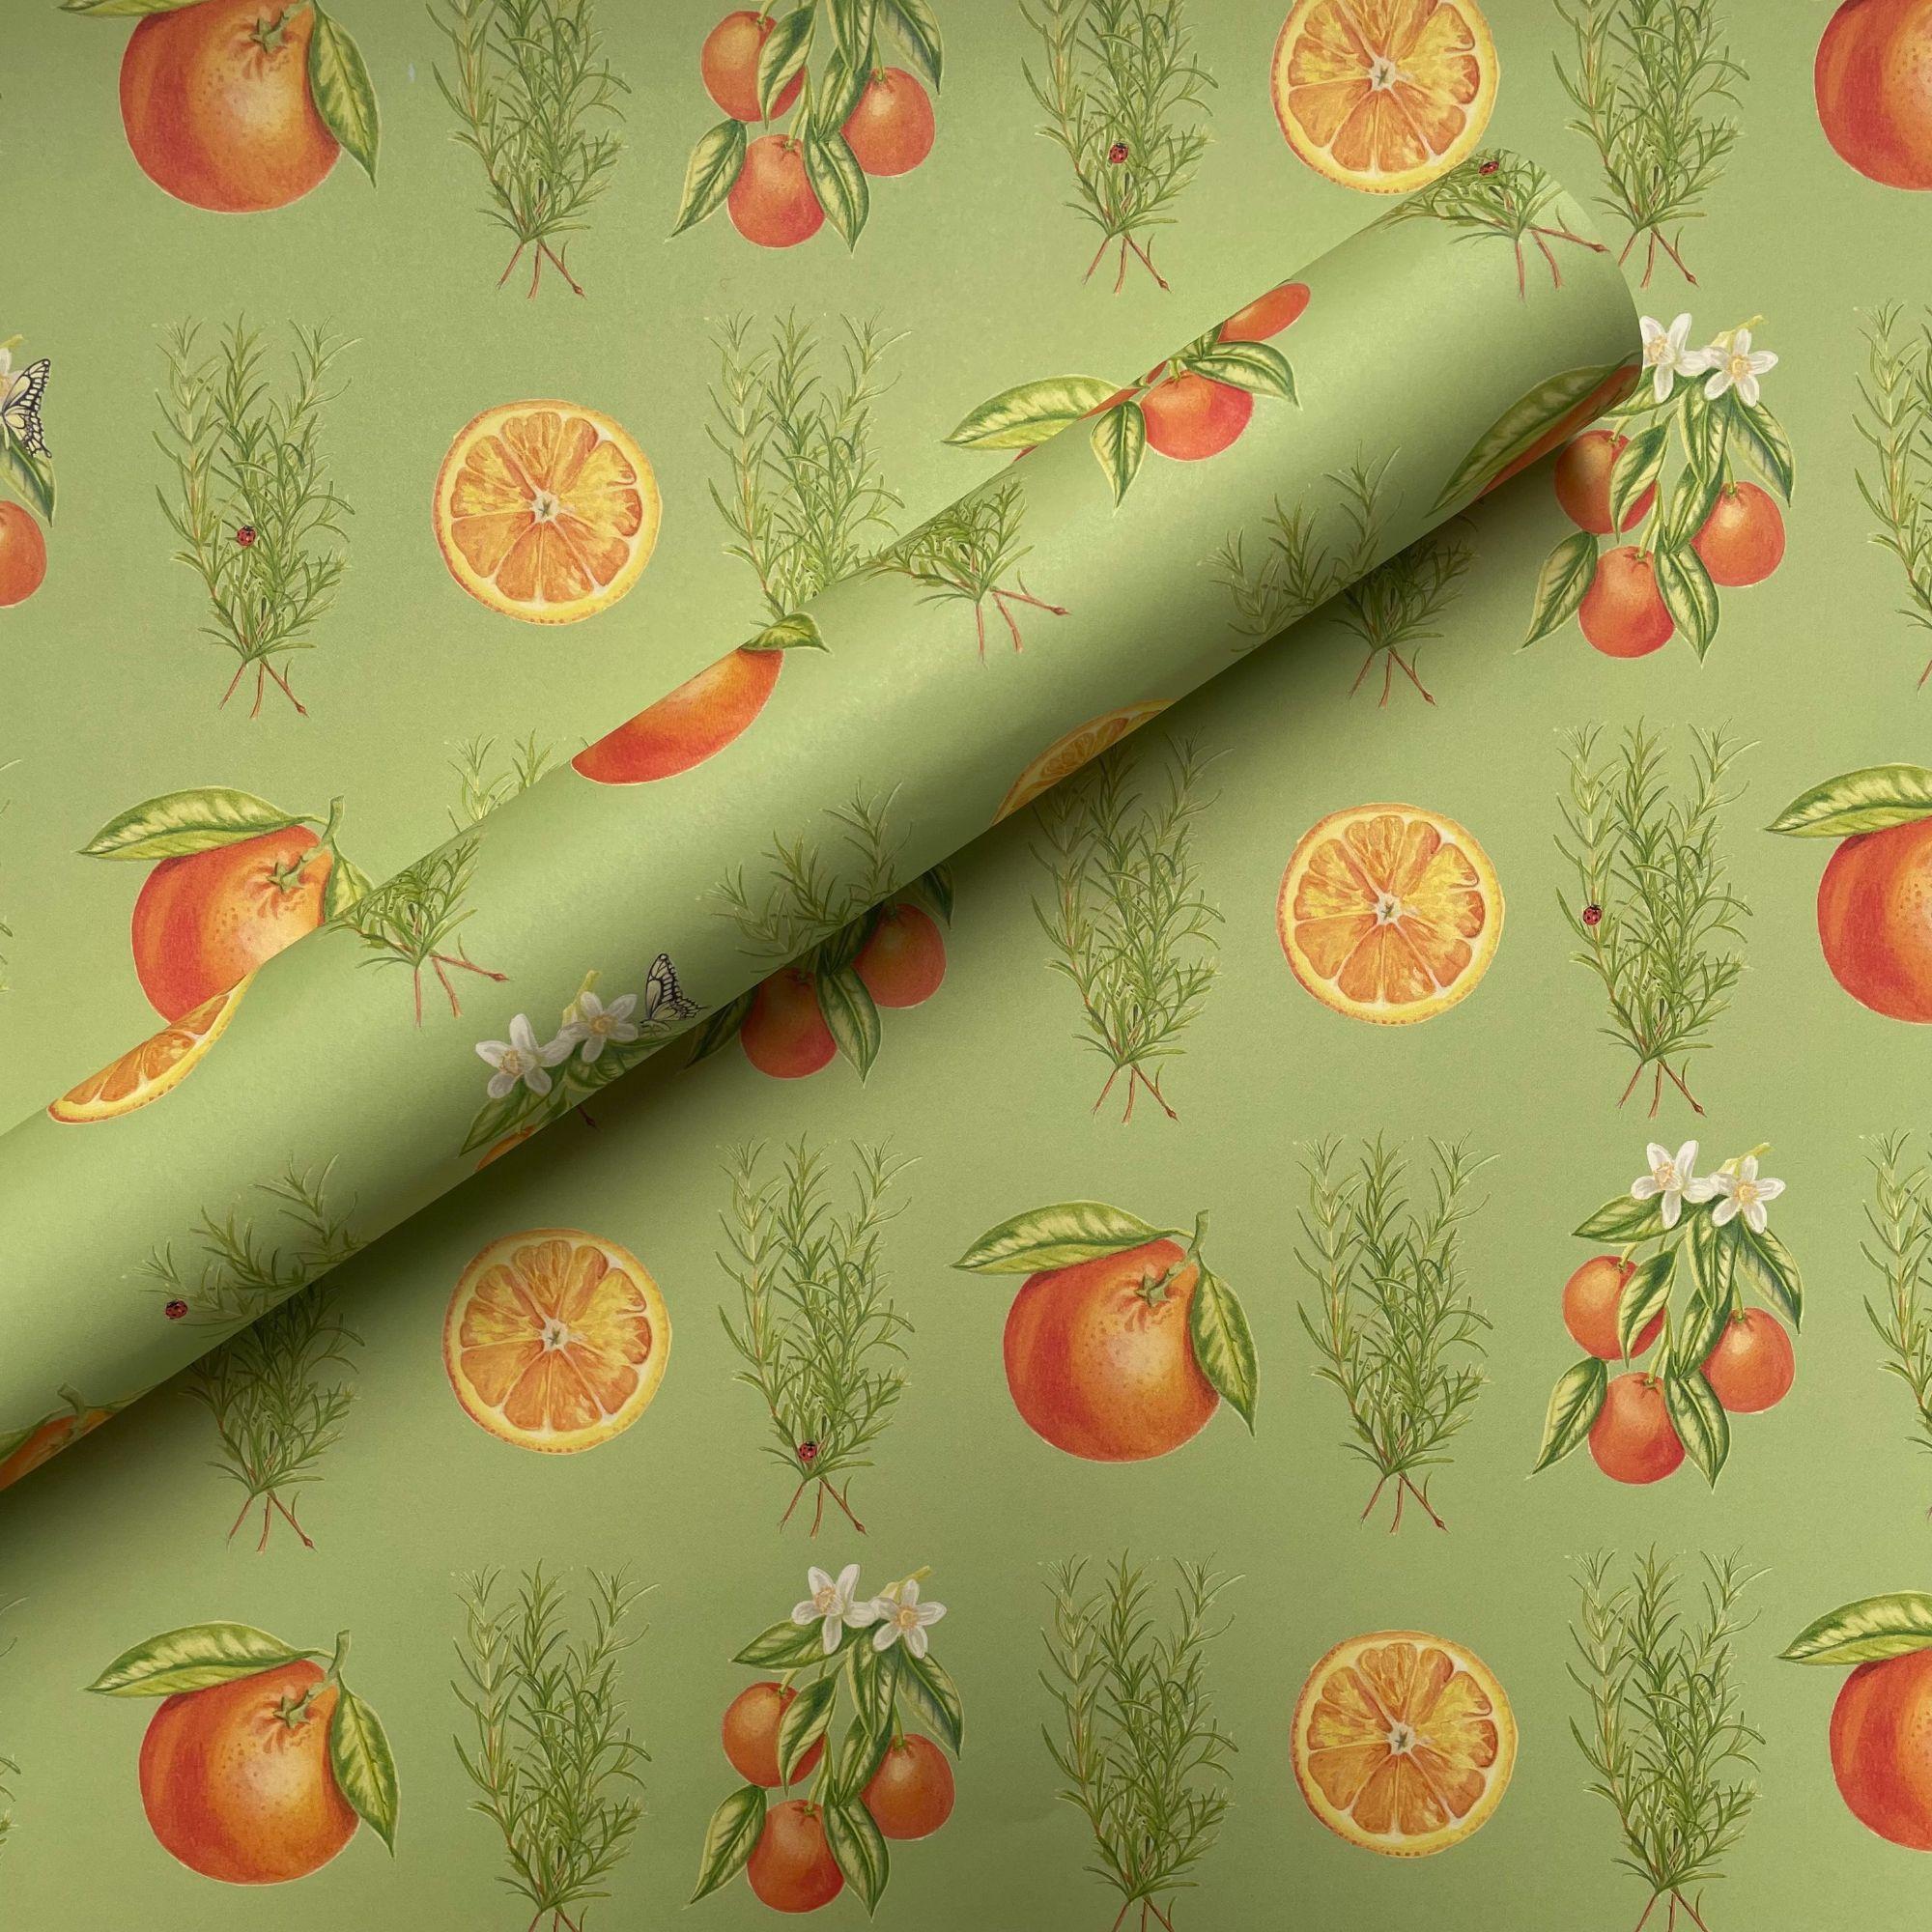 Rosemary & Orange.jpg